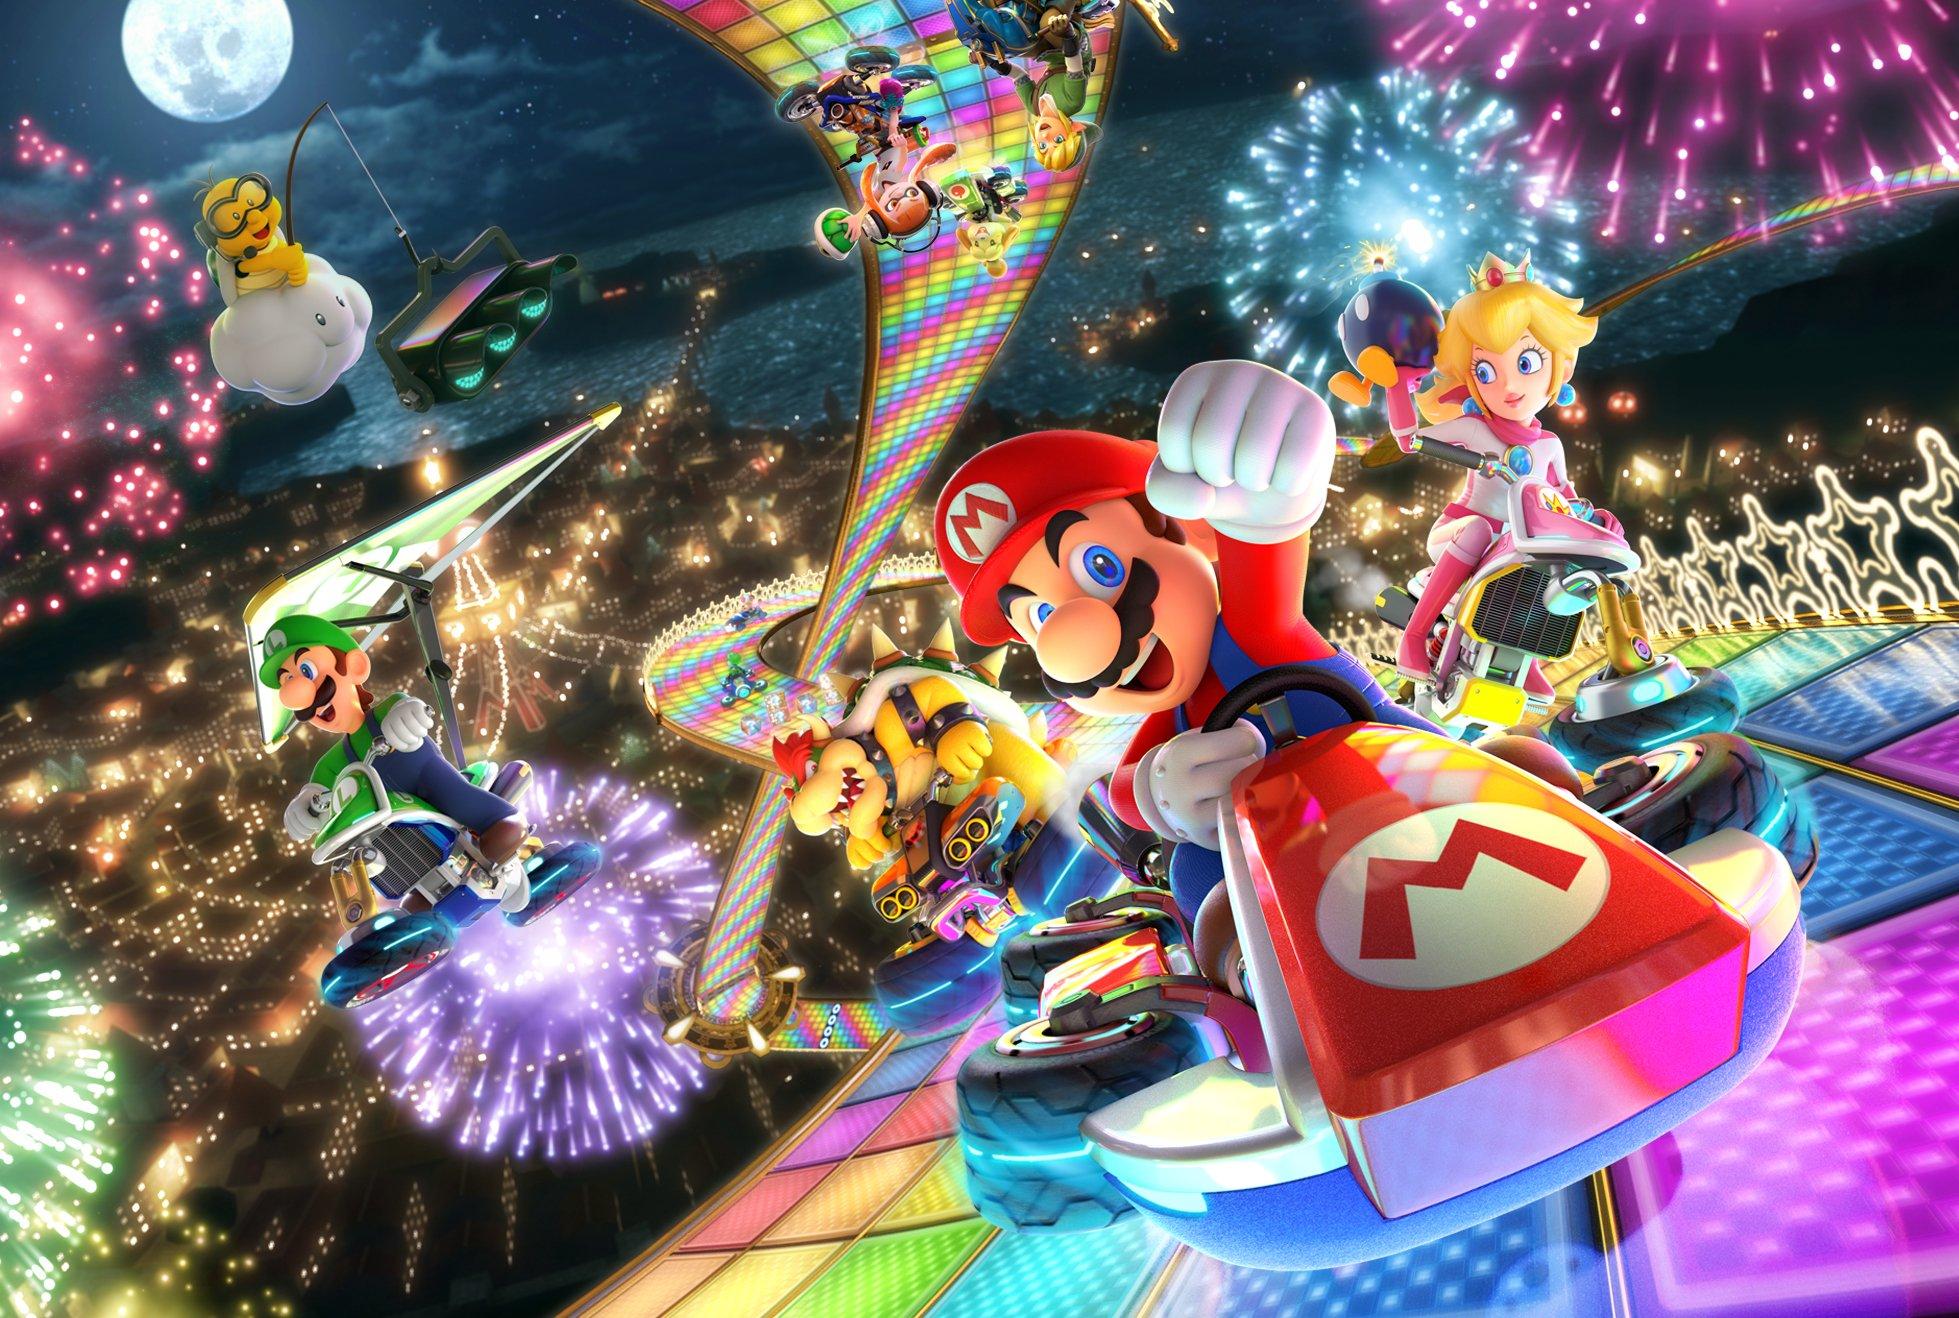 """Mario Kart"" characters racing on a rainbow track."